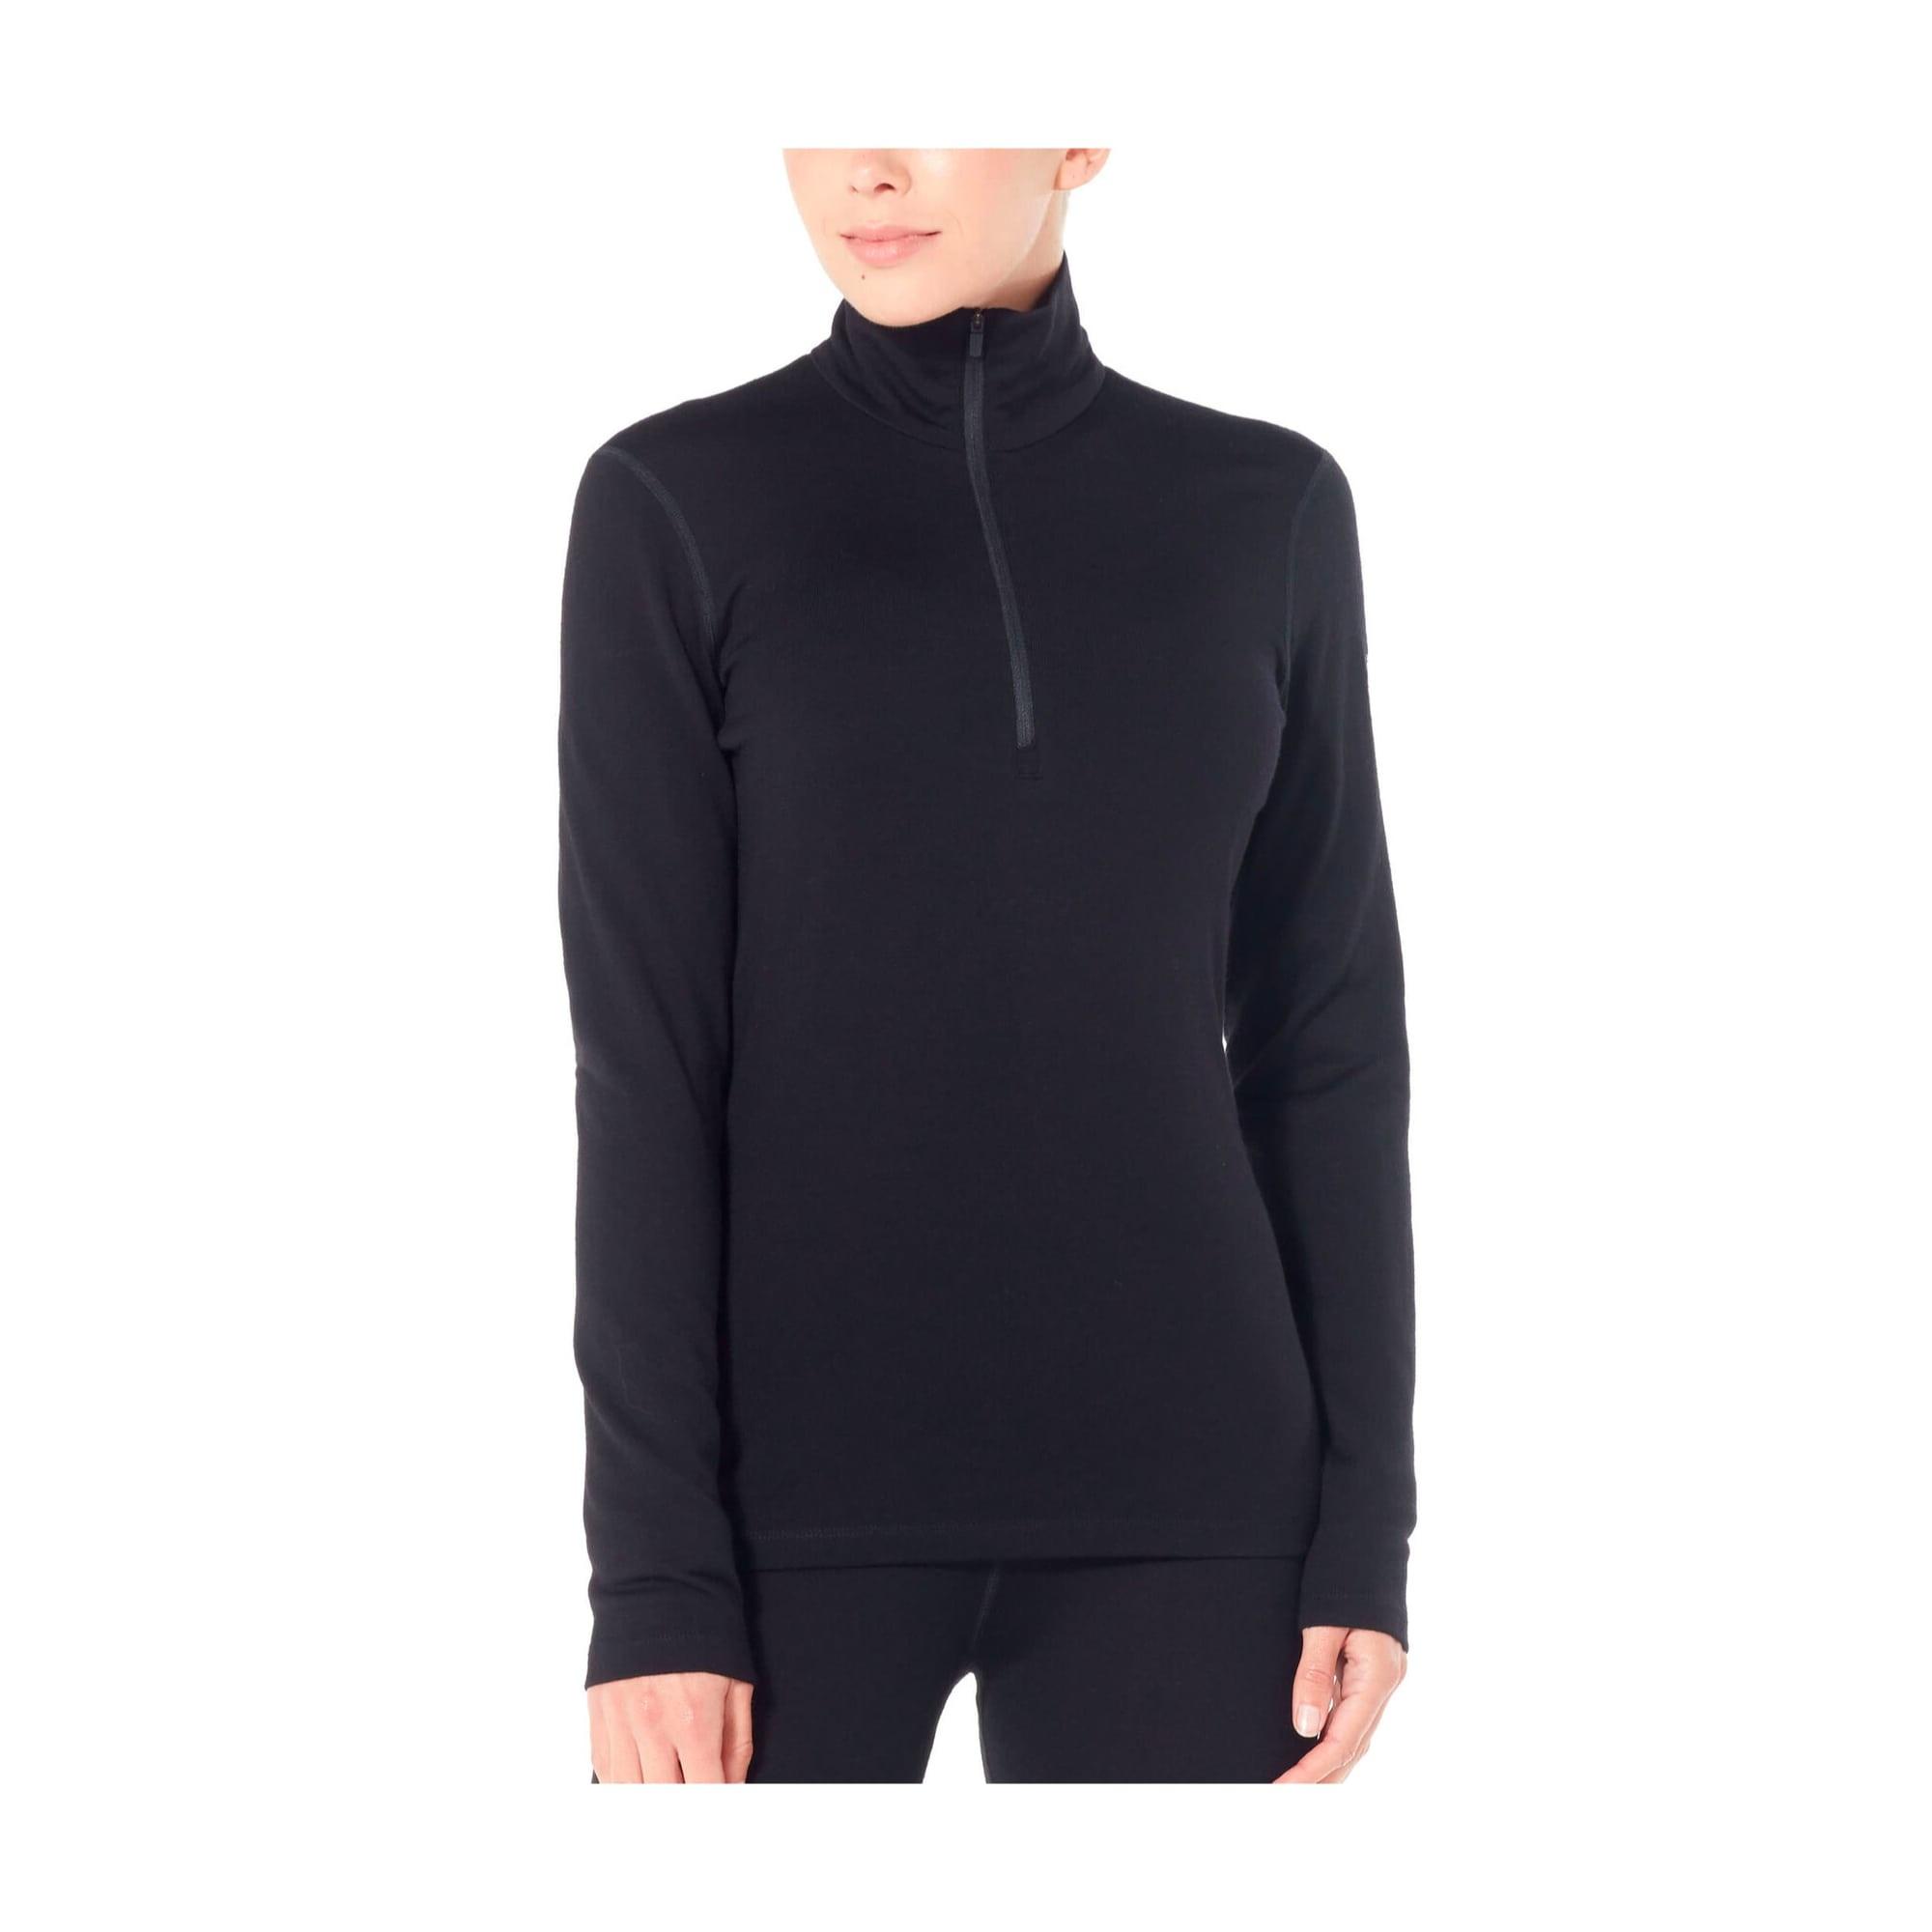 Women's 260 Tech Long Sleeve Half Zip-2